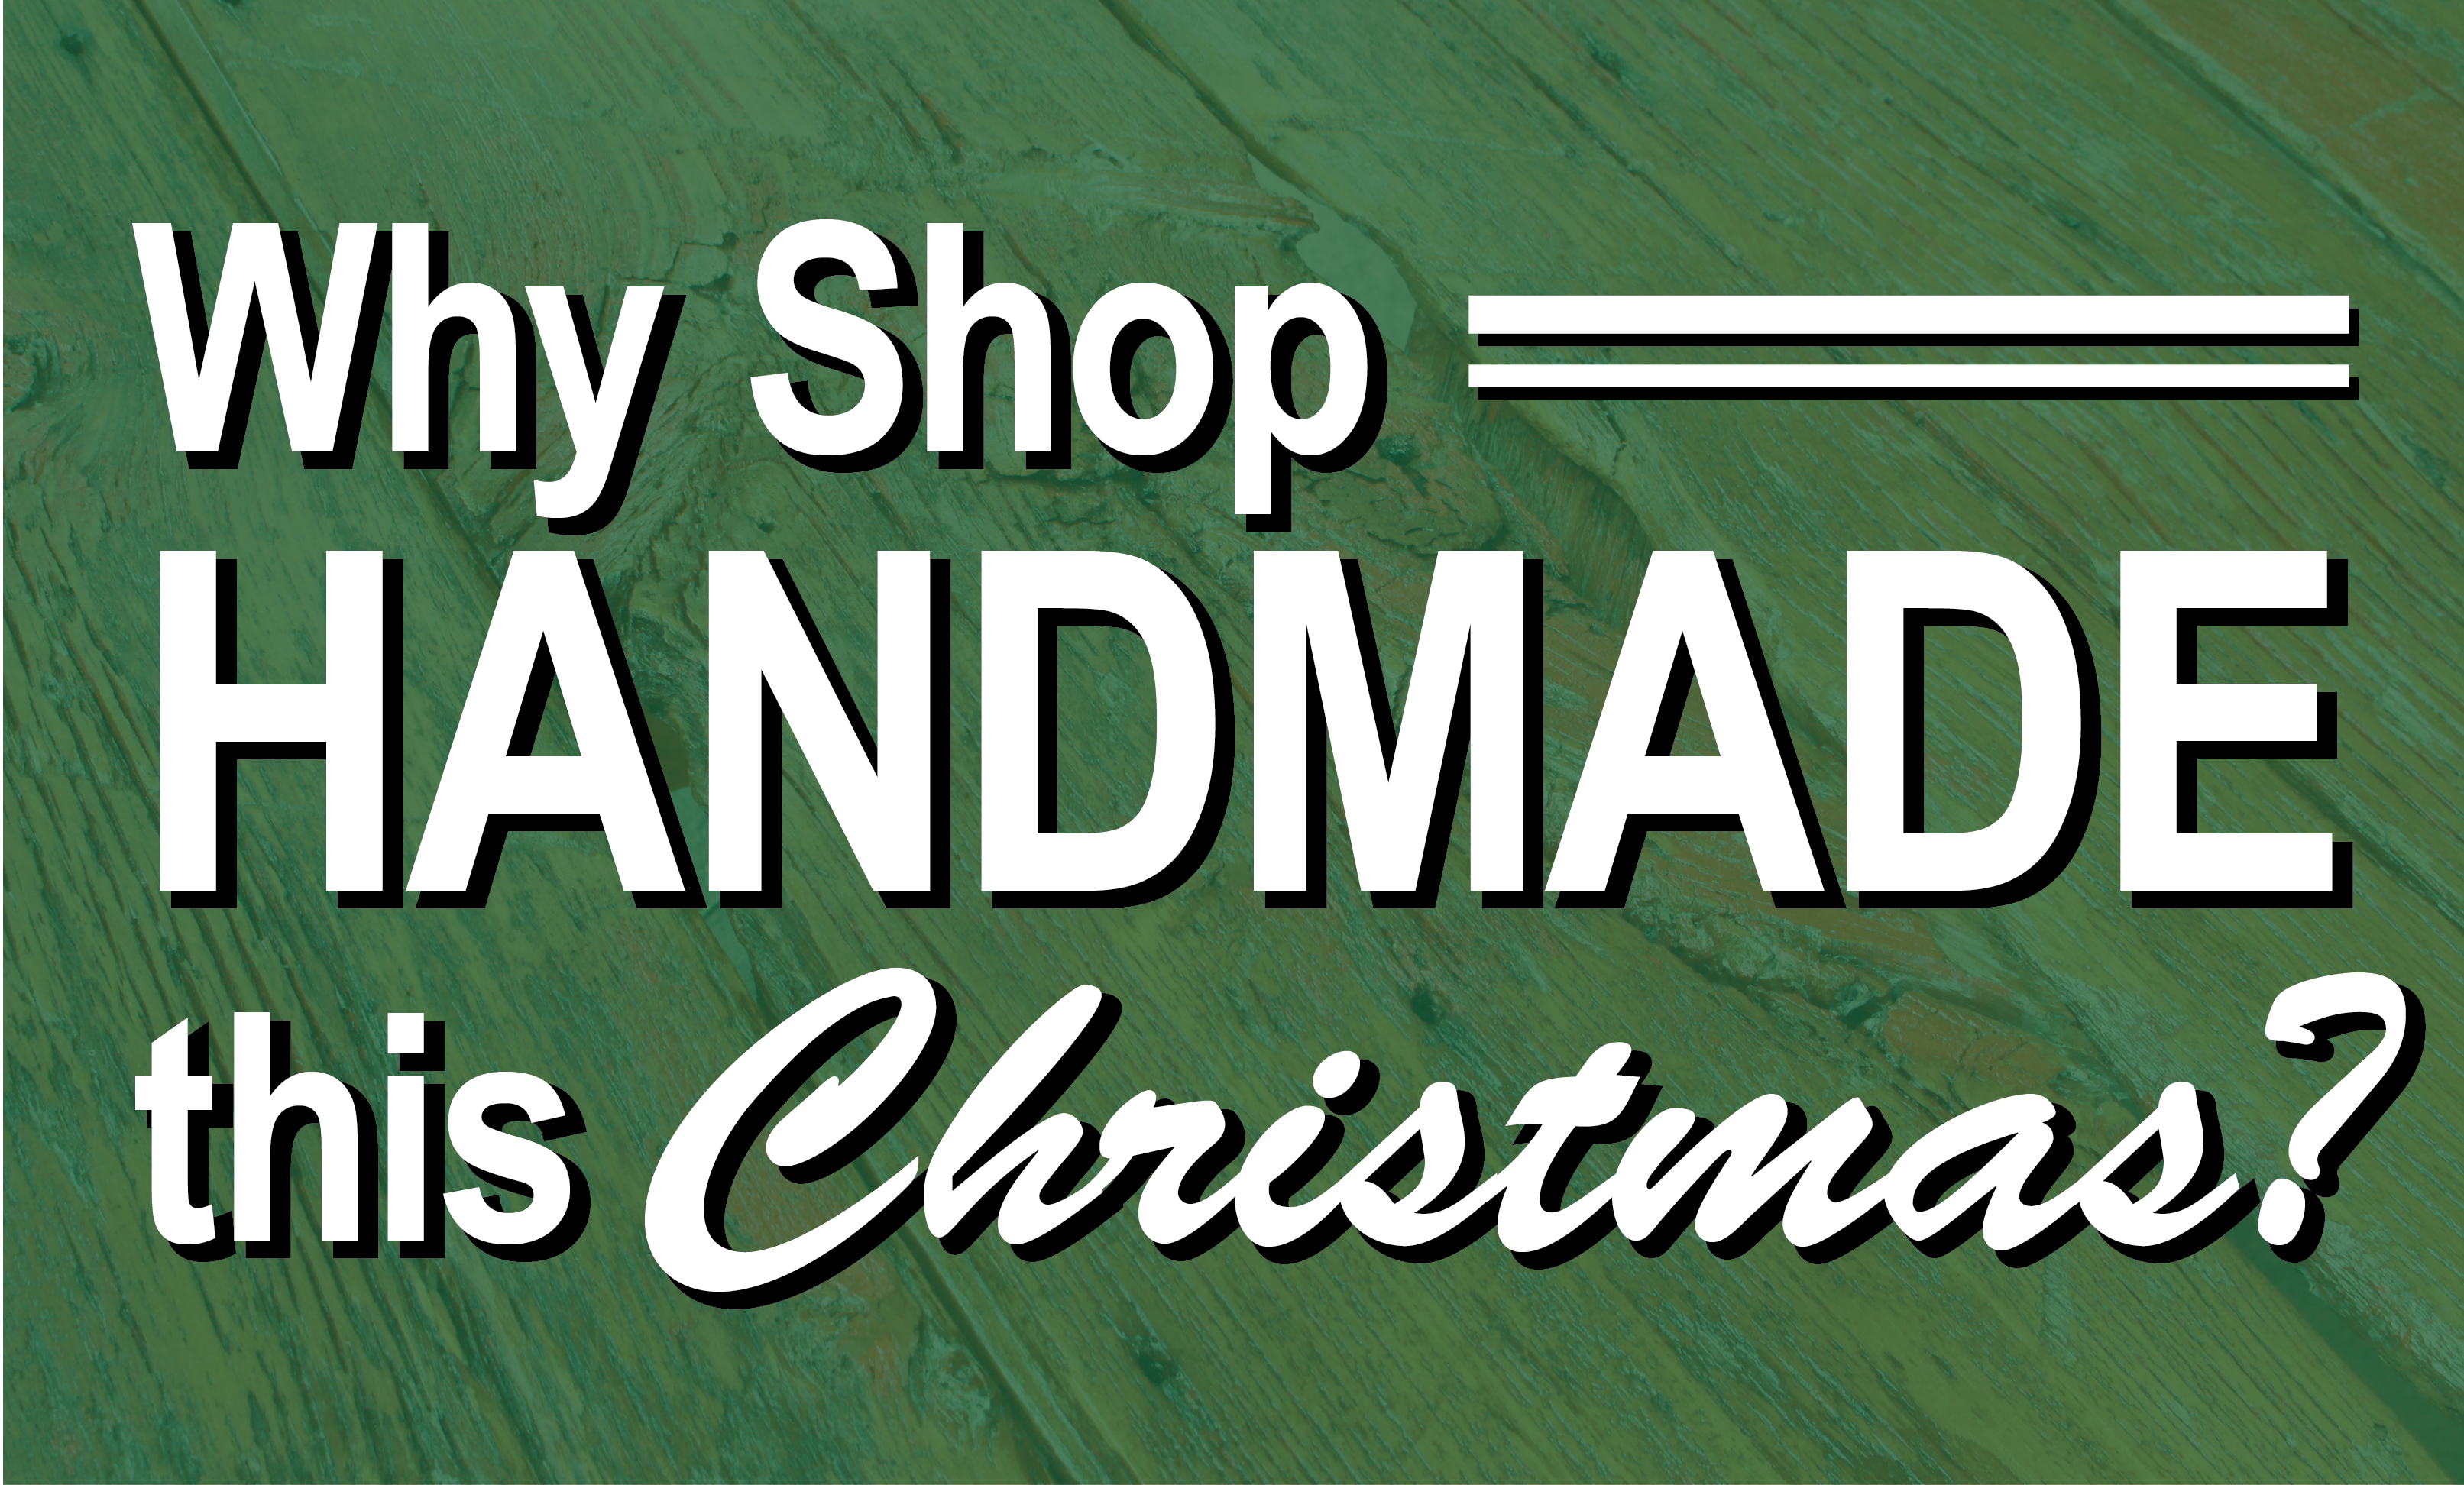 Why Shop Handmade This Christmas